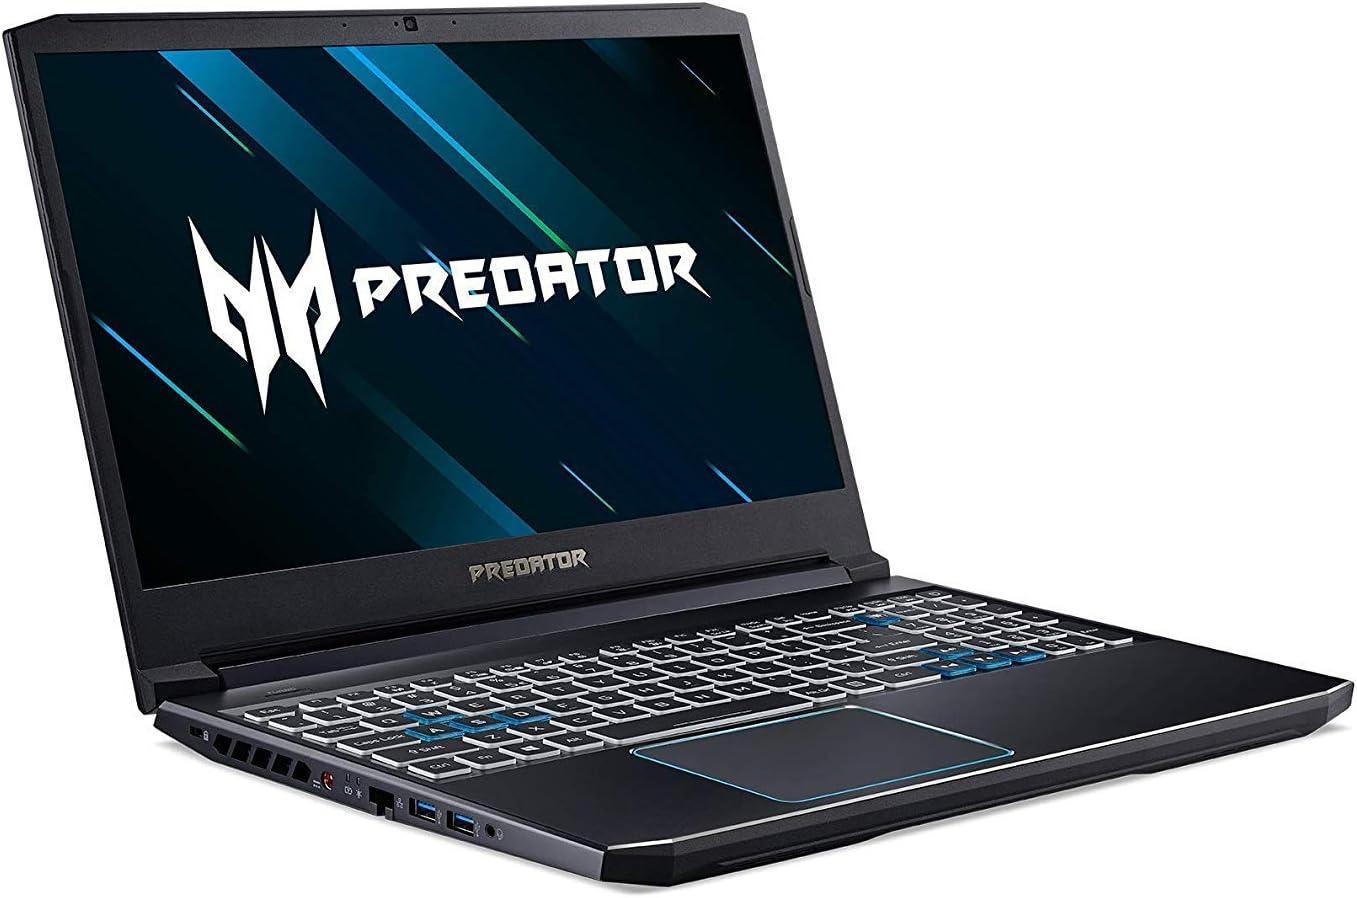 Acer Predator Helios PH315-52-54FDAcer Predator Helios PH315-52-54FD